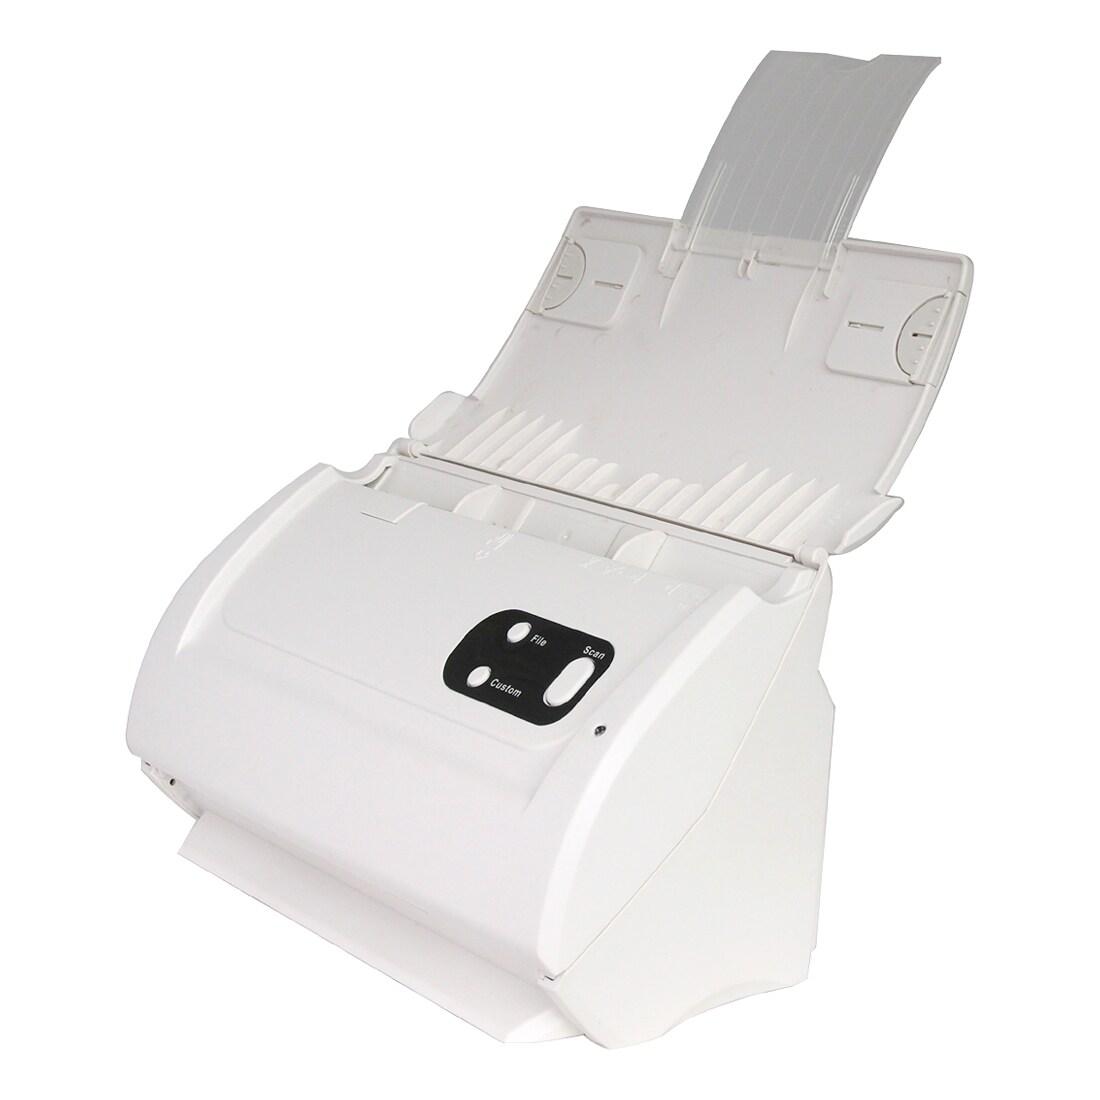 600 dpi Optical Plustek MobileOffice S410 Sheetfed Scanner